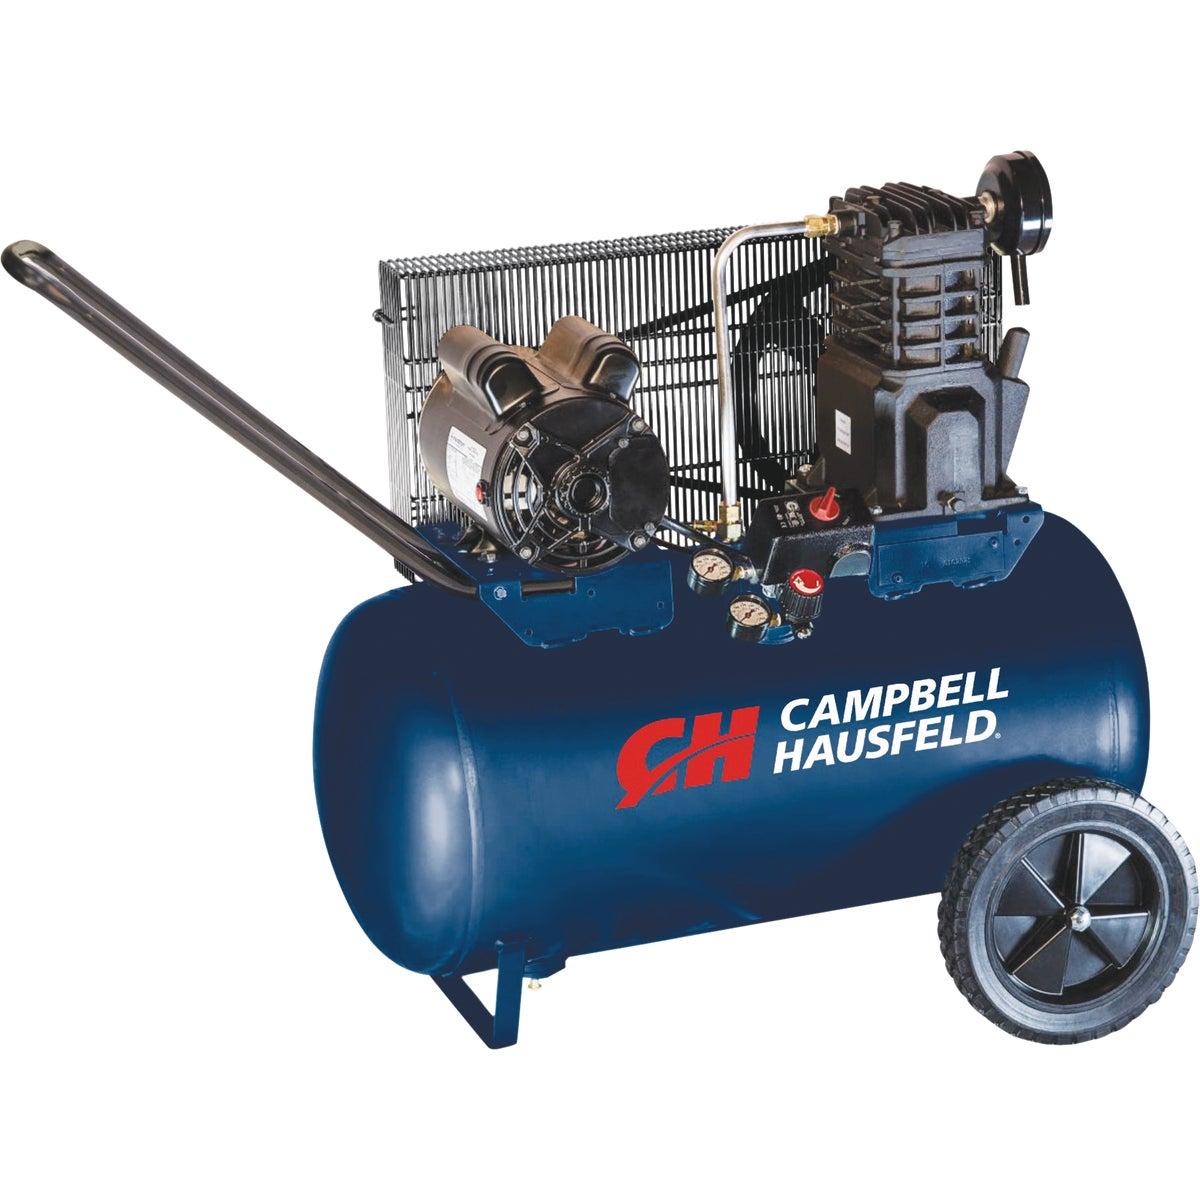 Campbell Hausfeld 20 Gal. 2 HP Air Compressor